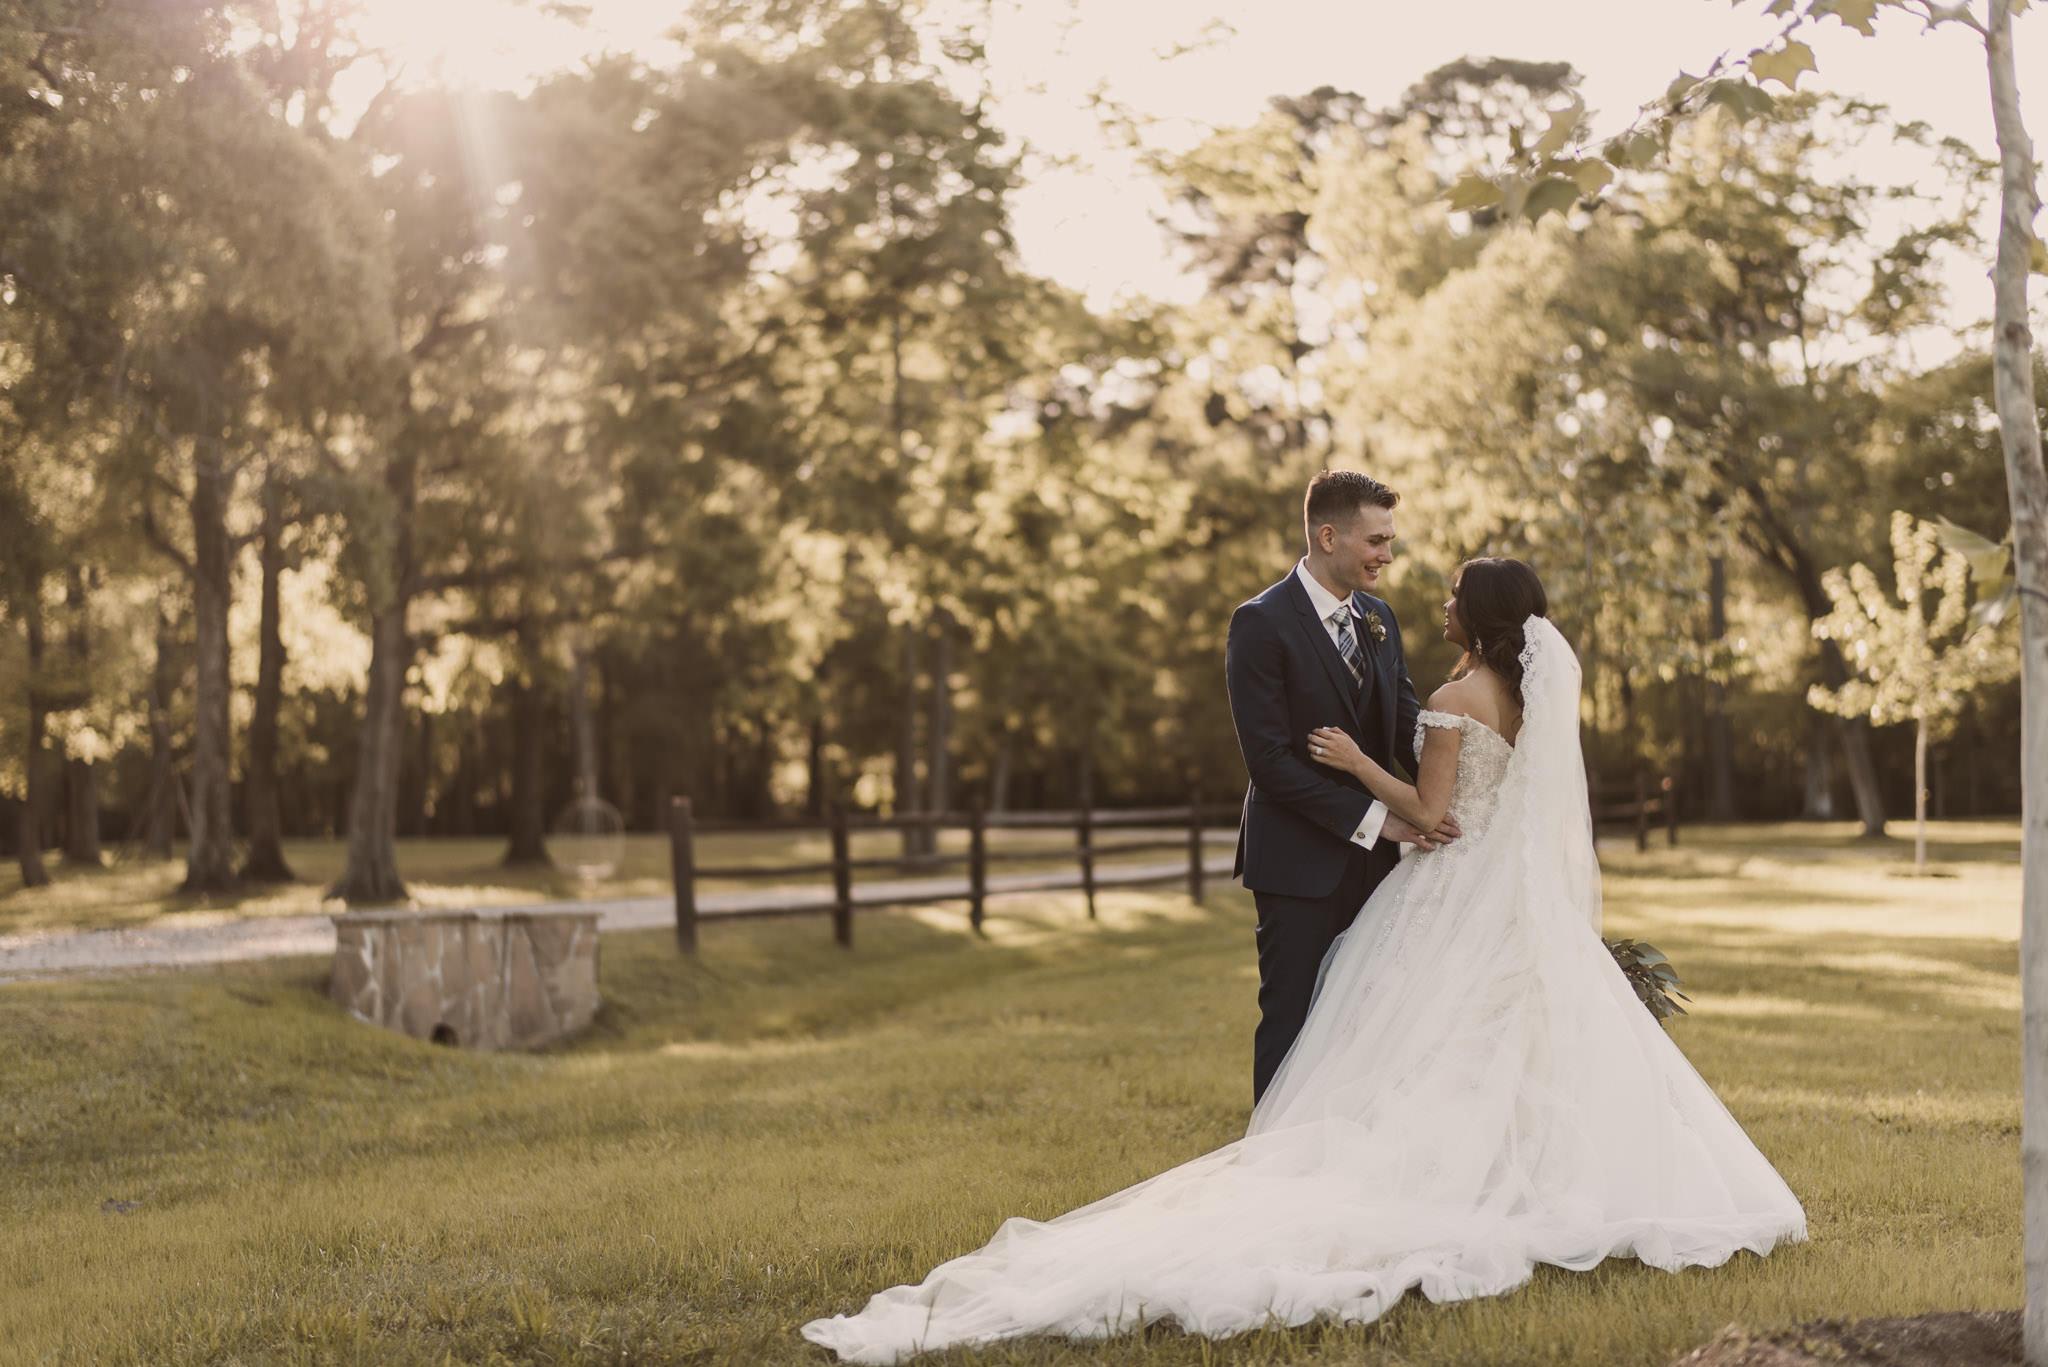 adriana-christian-wedding-re-sm-114.jpg